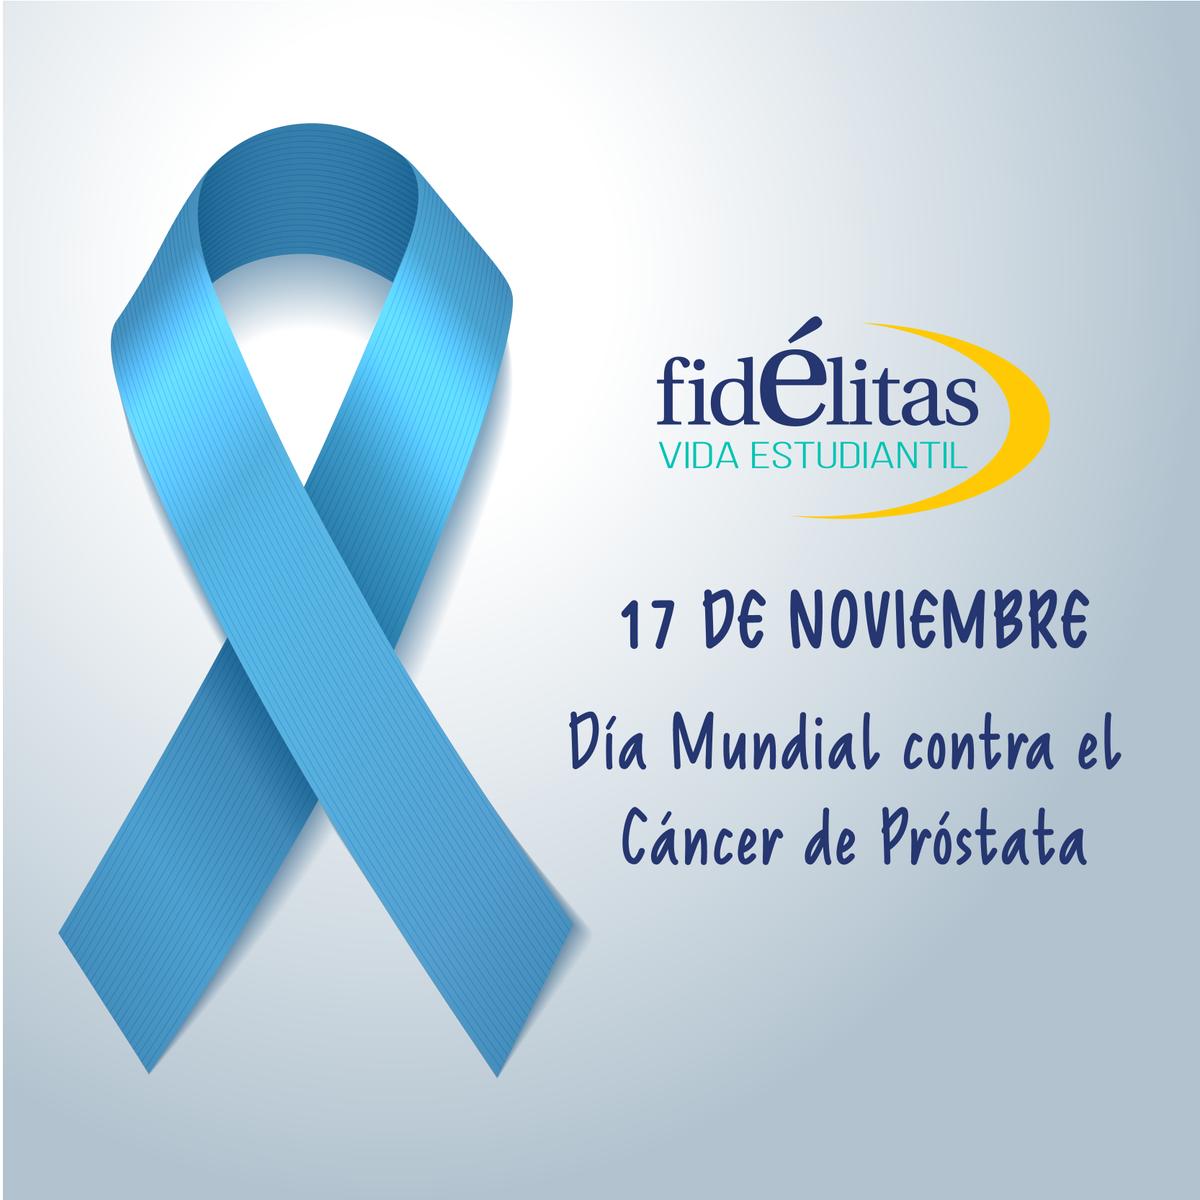 dia mundial del cancer de prostata